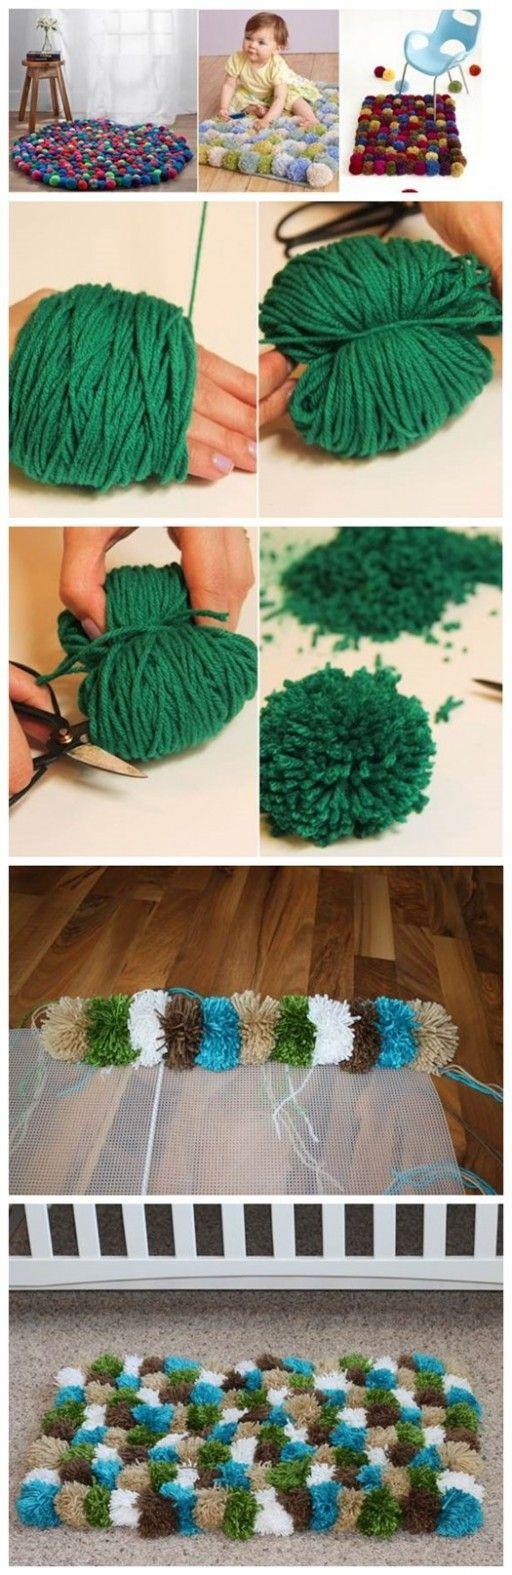 How To Make DIY Pom Pom Rugs Tutorial 2